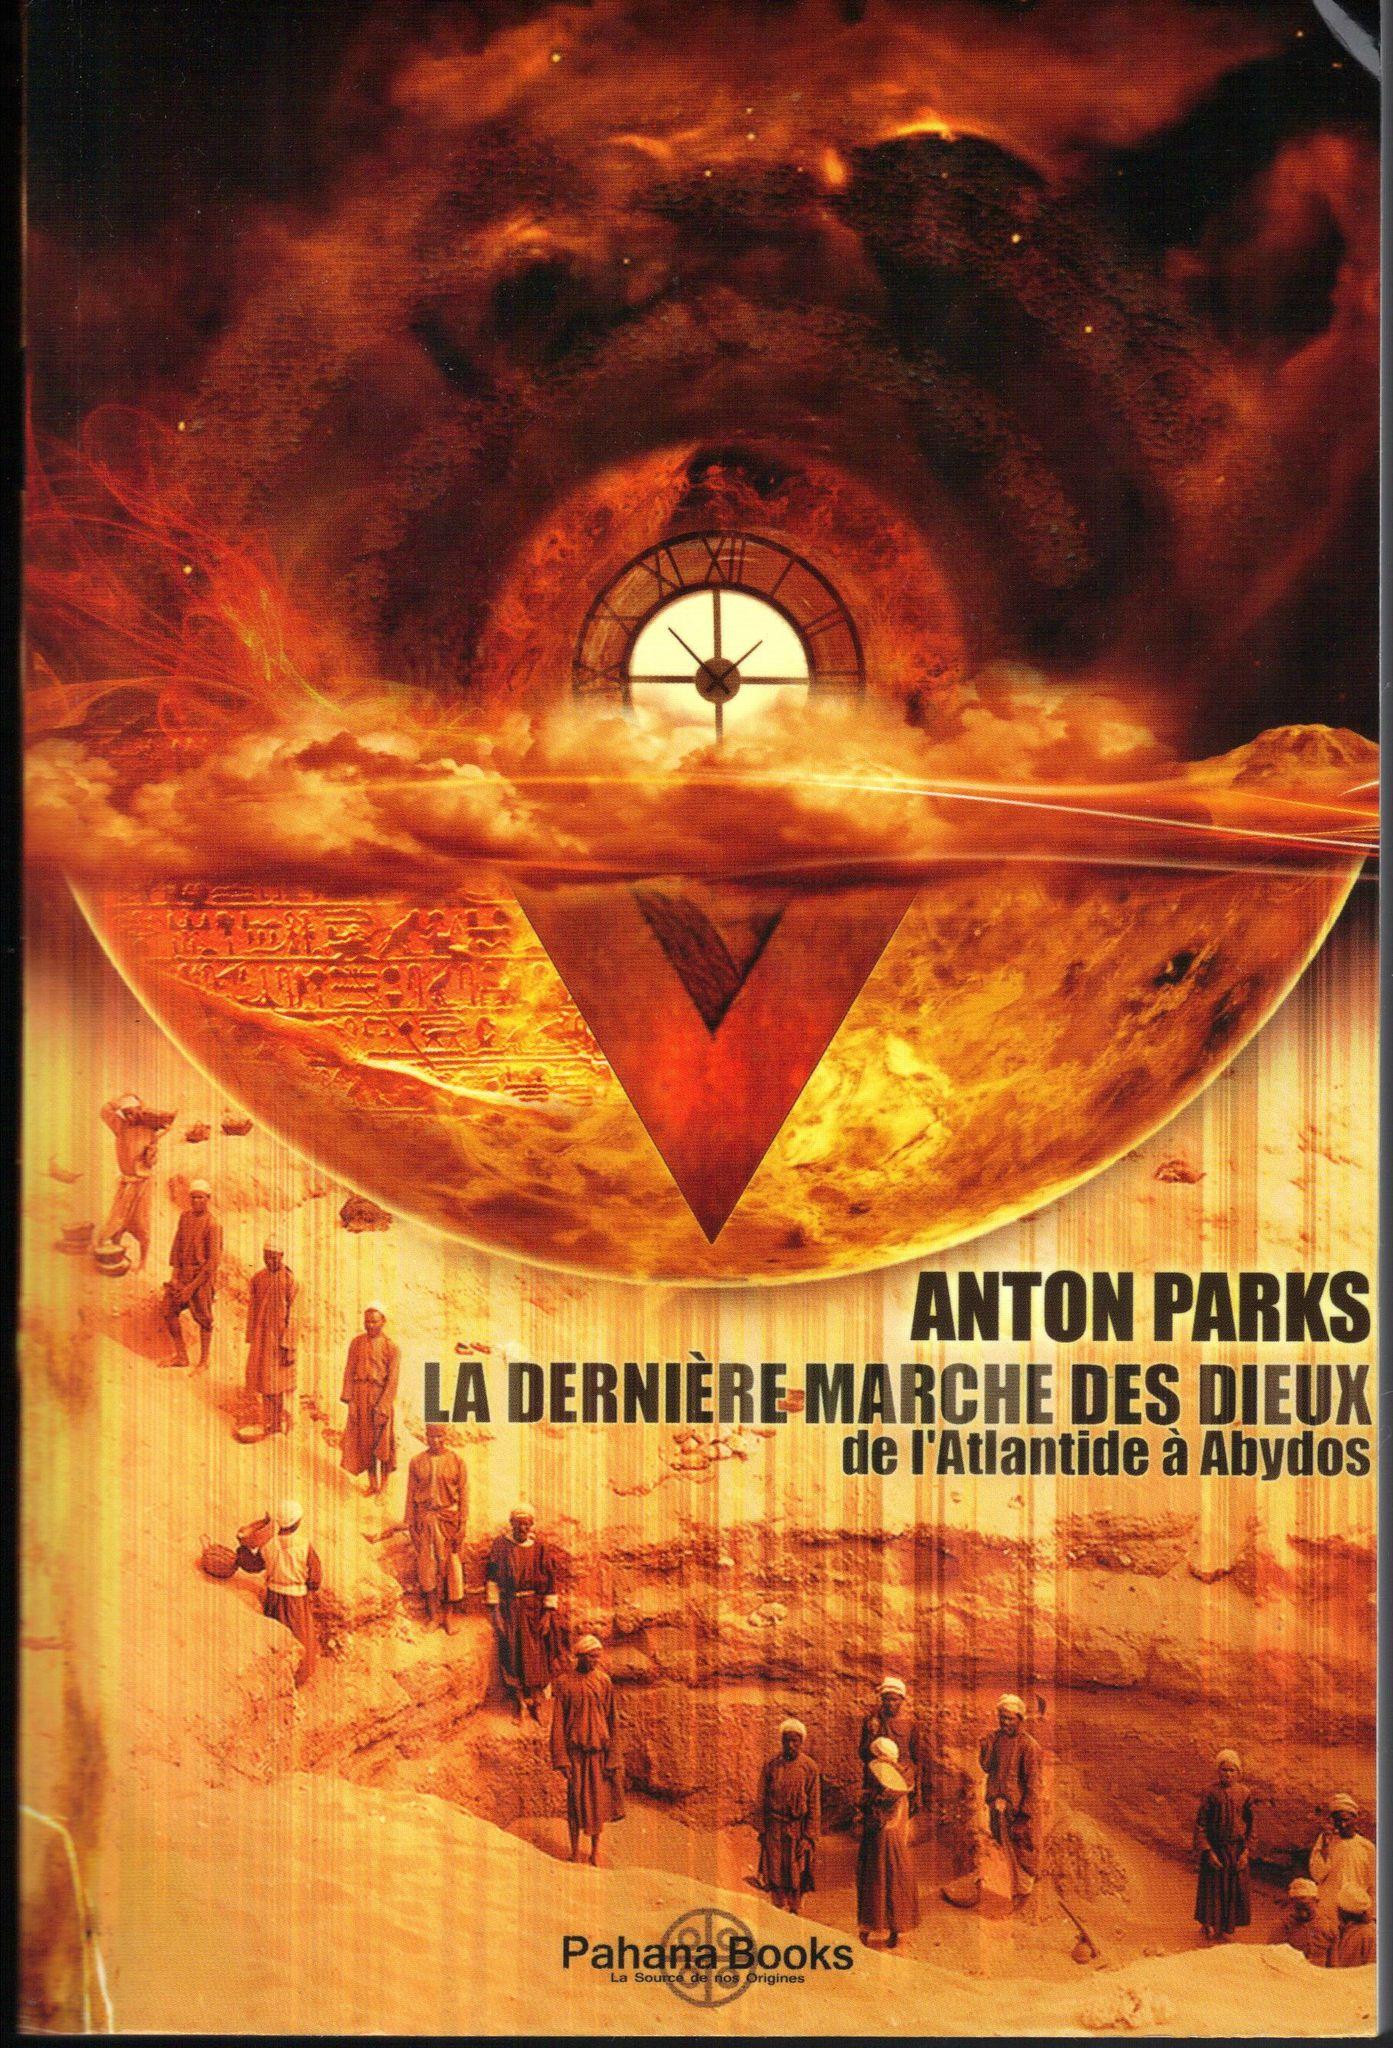 Anton Parks